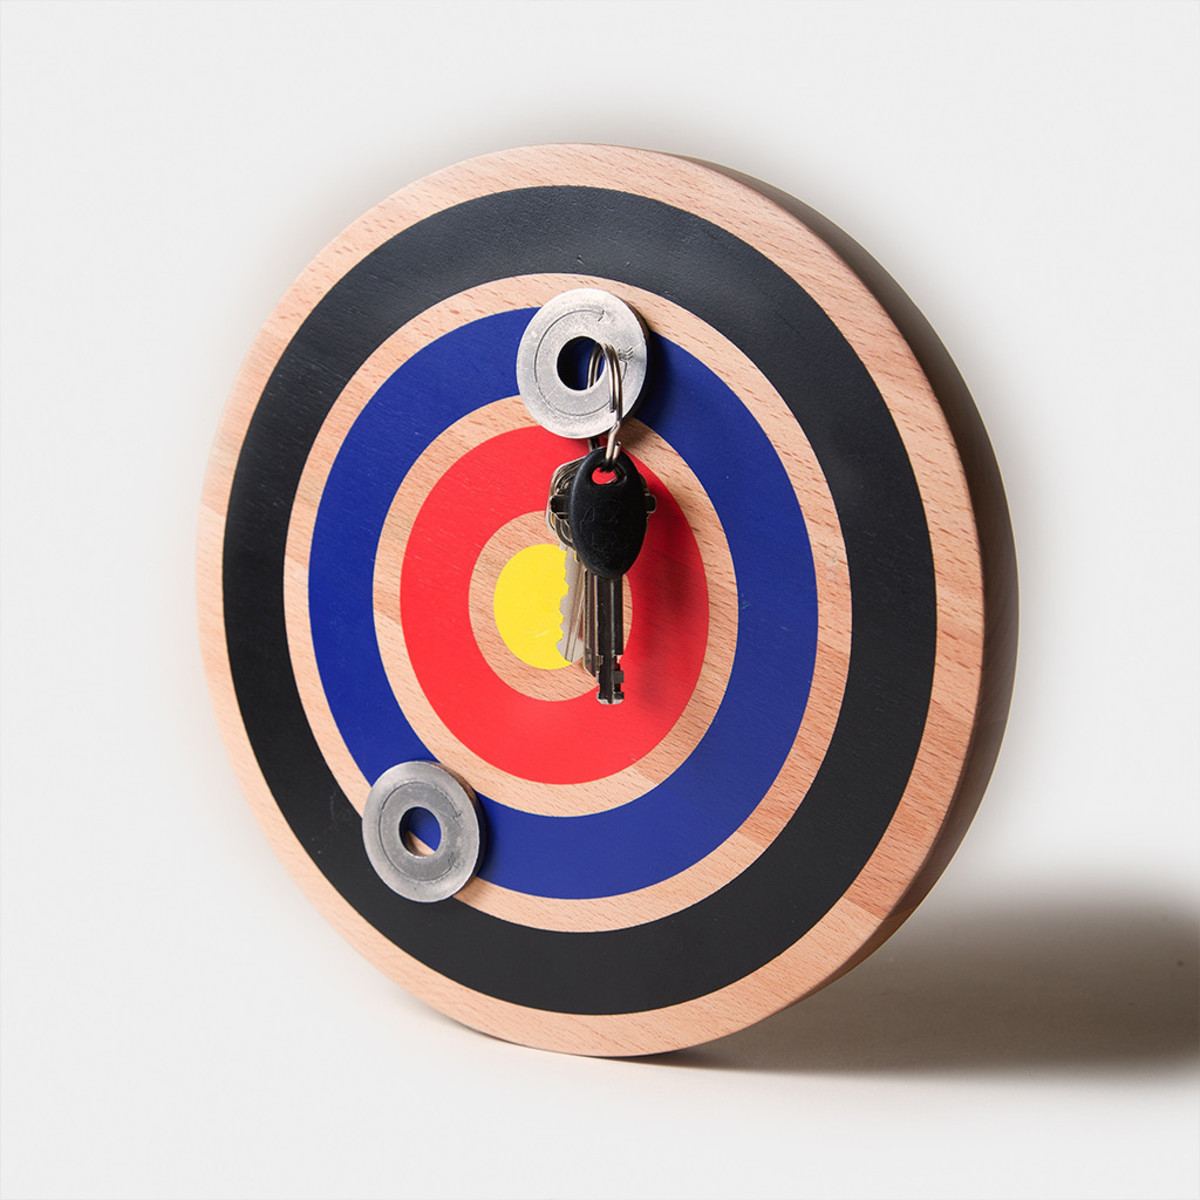 key-target-2_2180bd23-0531-4630-93bc-a41bfbe688c2_1024x1024